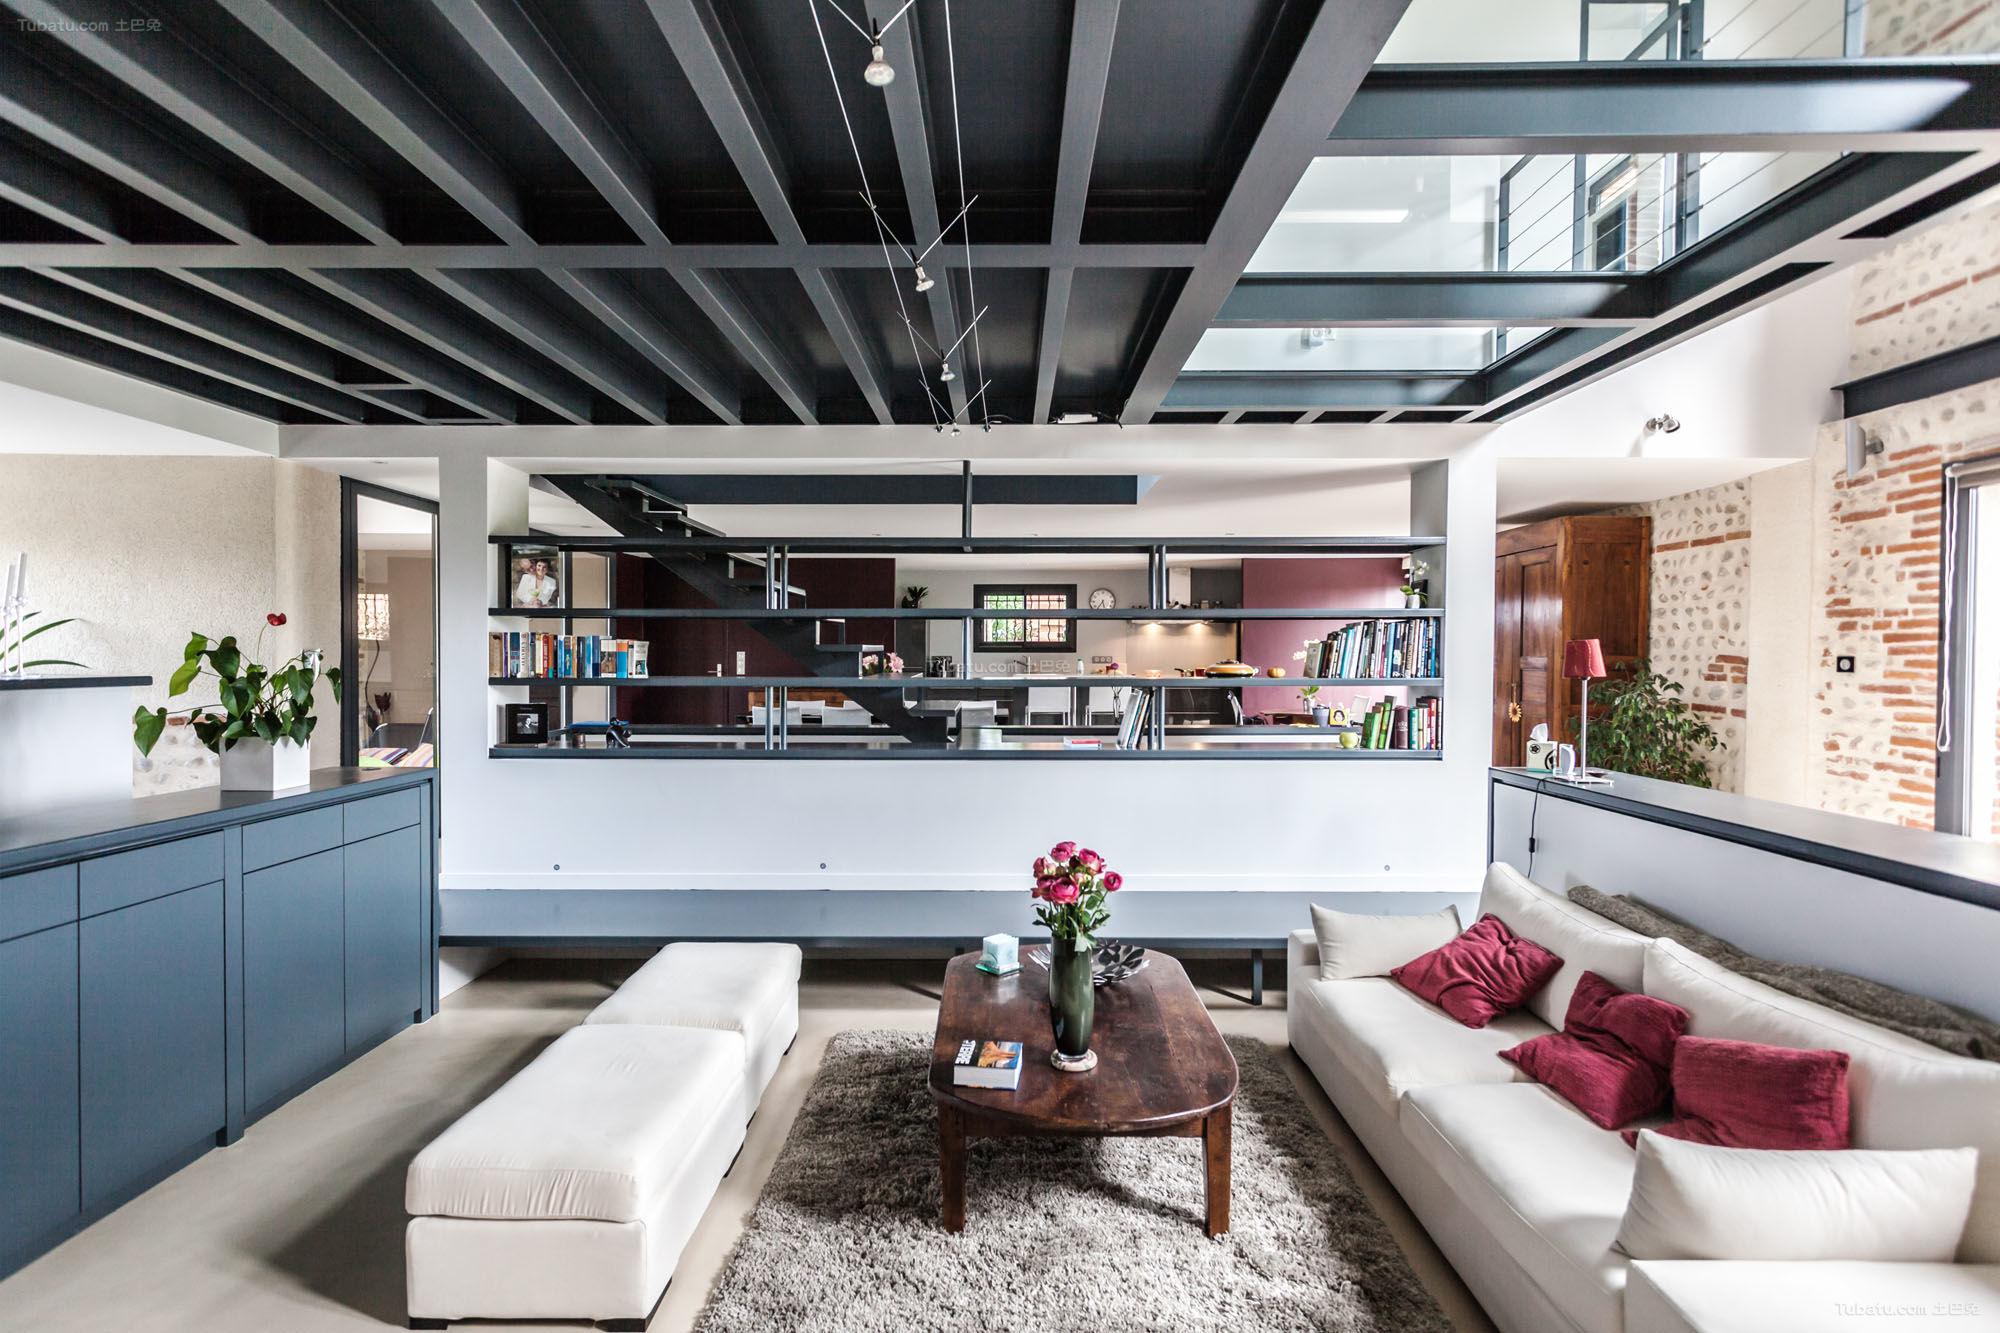 loft风格复古低调二居室图